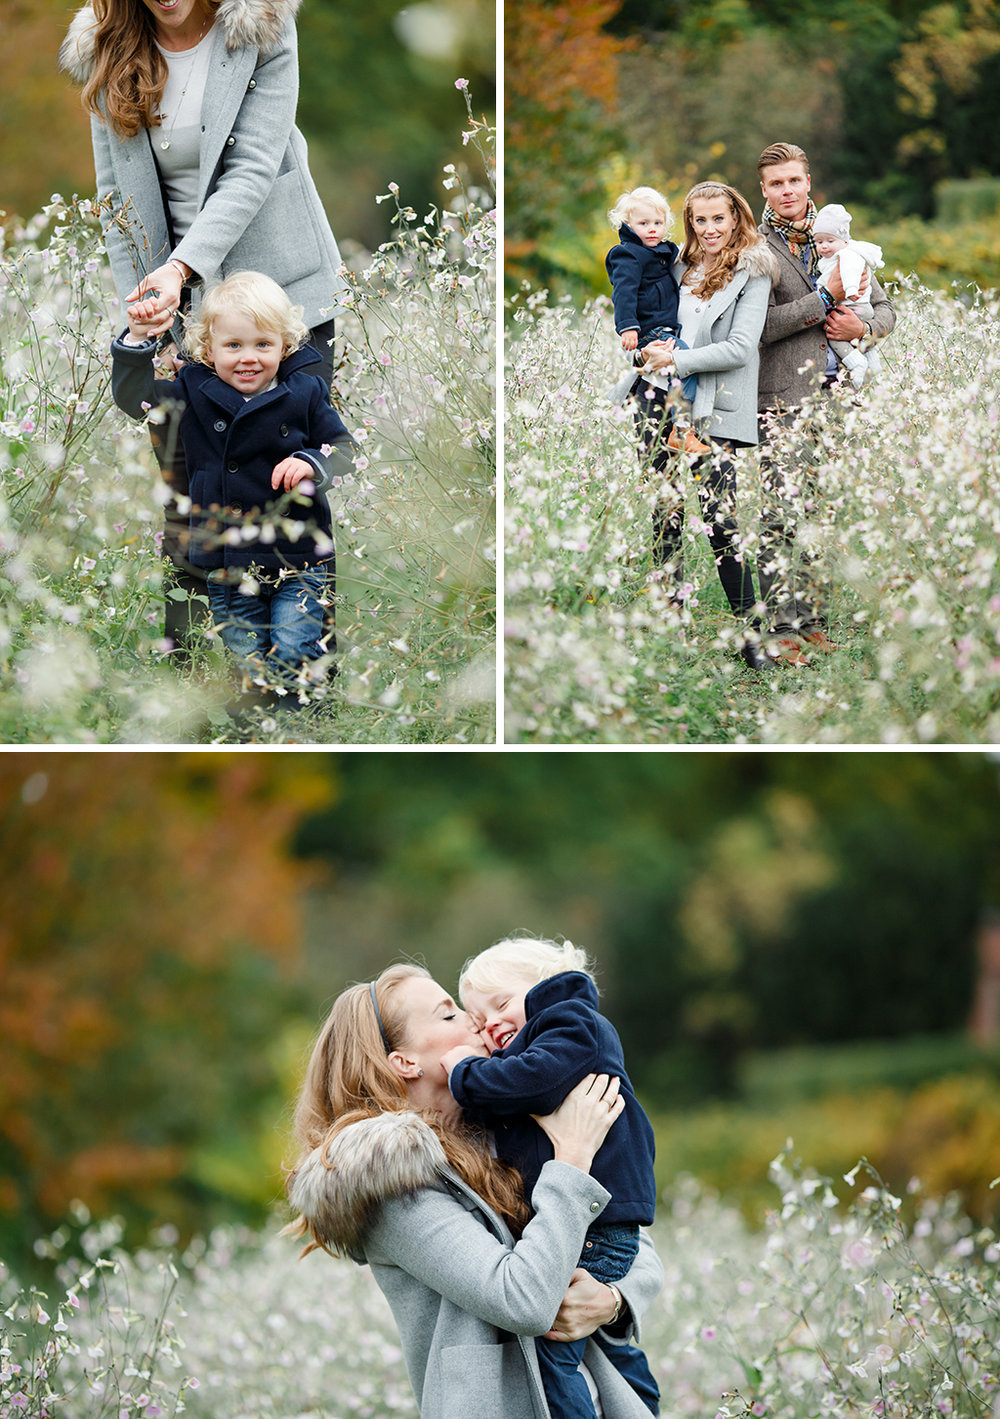 Familjefotografering_Hostfotografering_Familjefotograf-Stockholm_7.jpg